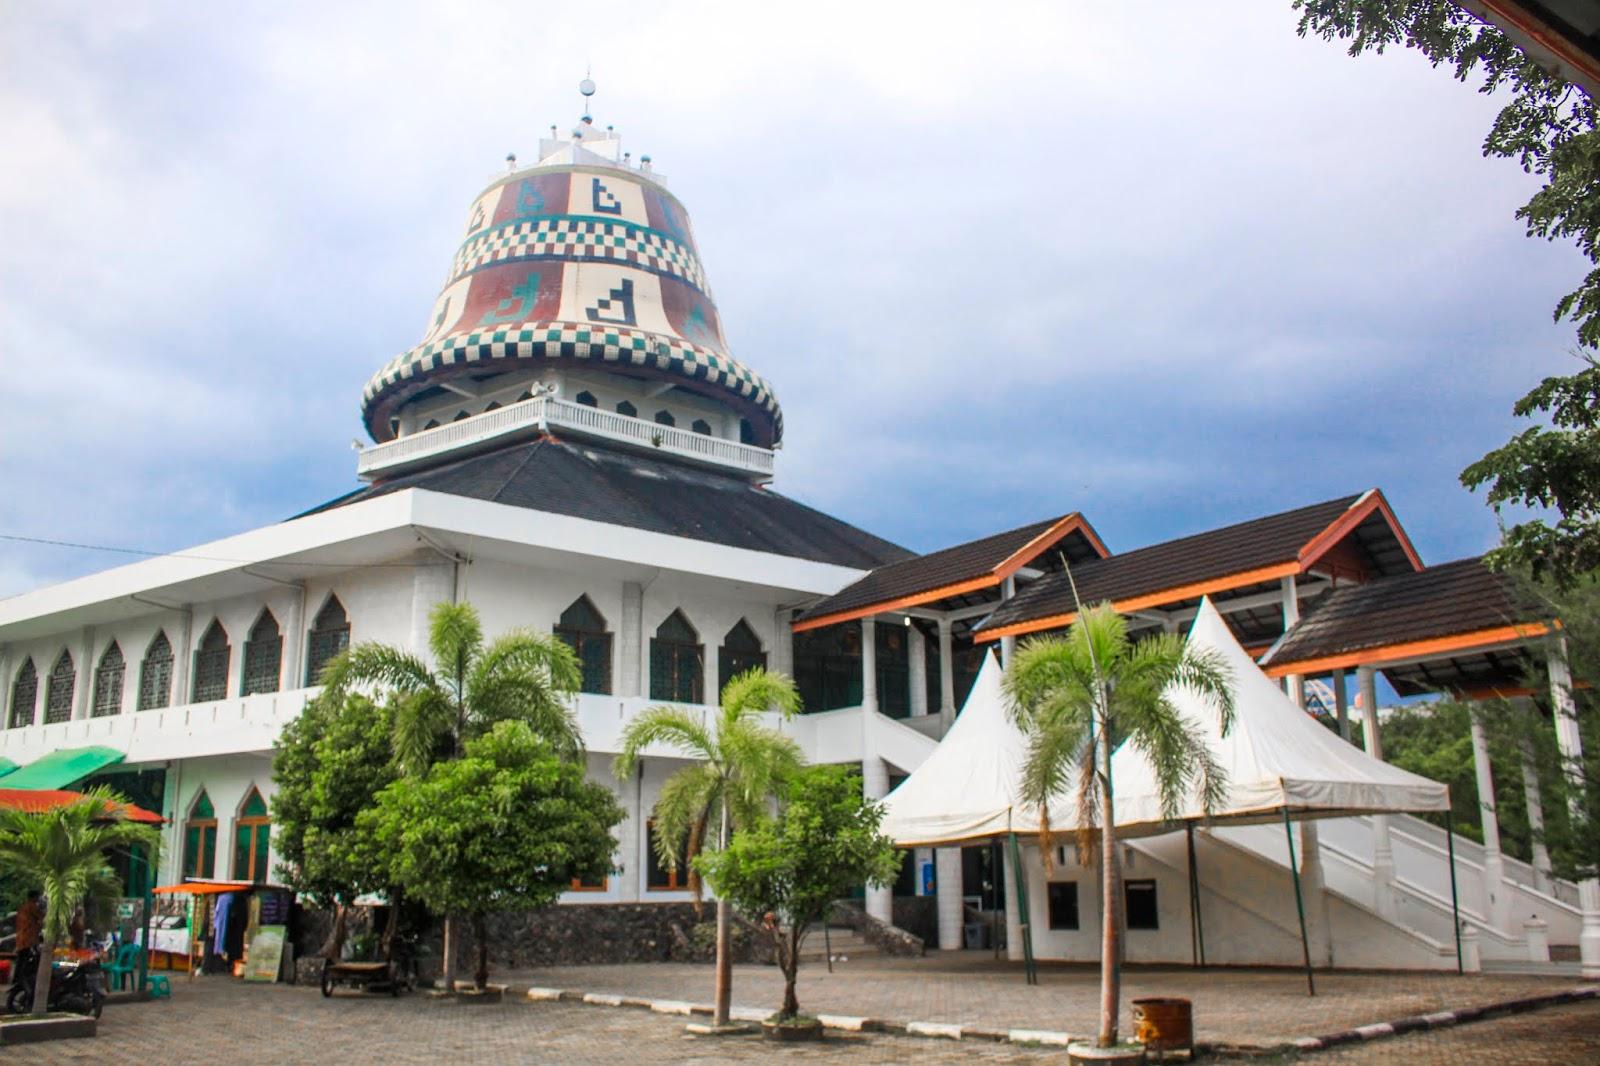 Pesona Masjid Teuku Umar Masjid Sang Pahlawan Jak Wisata